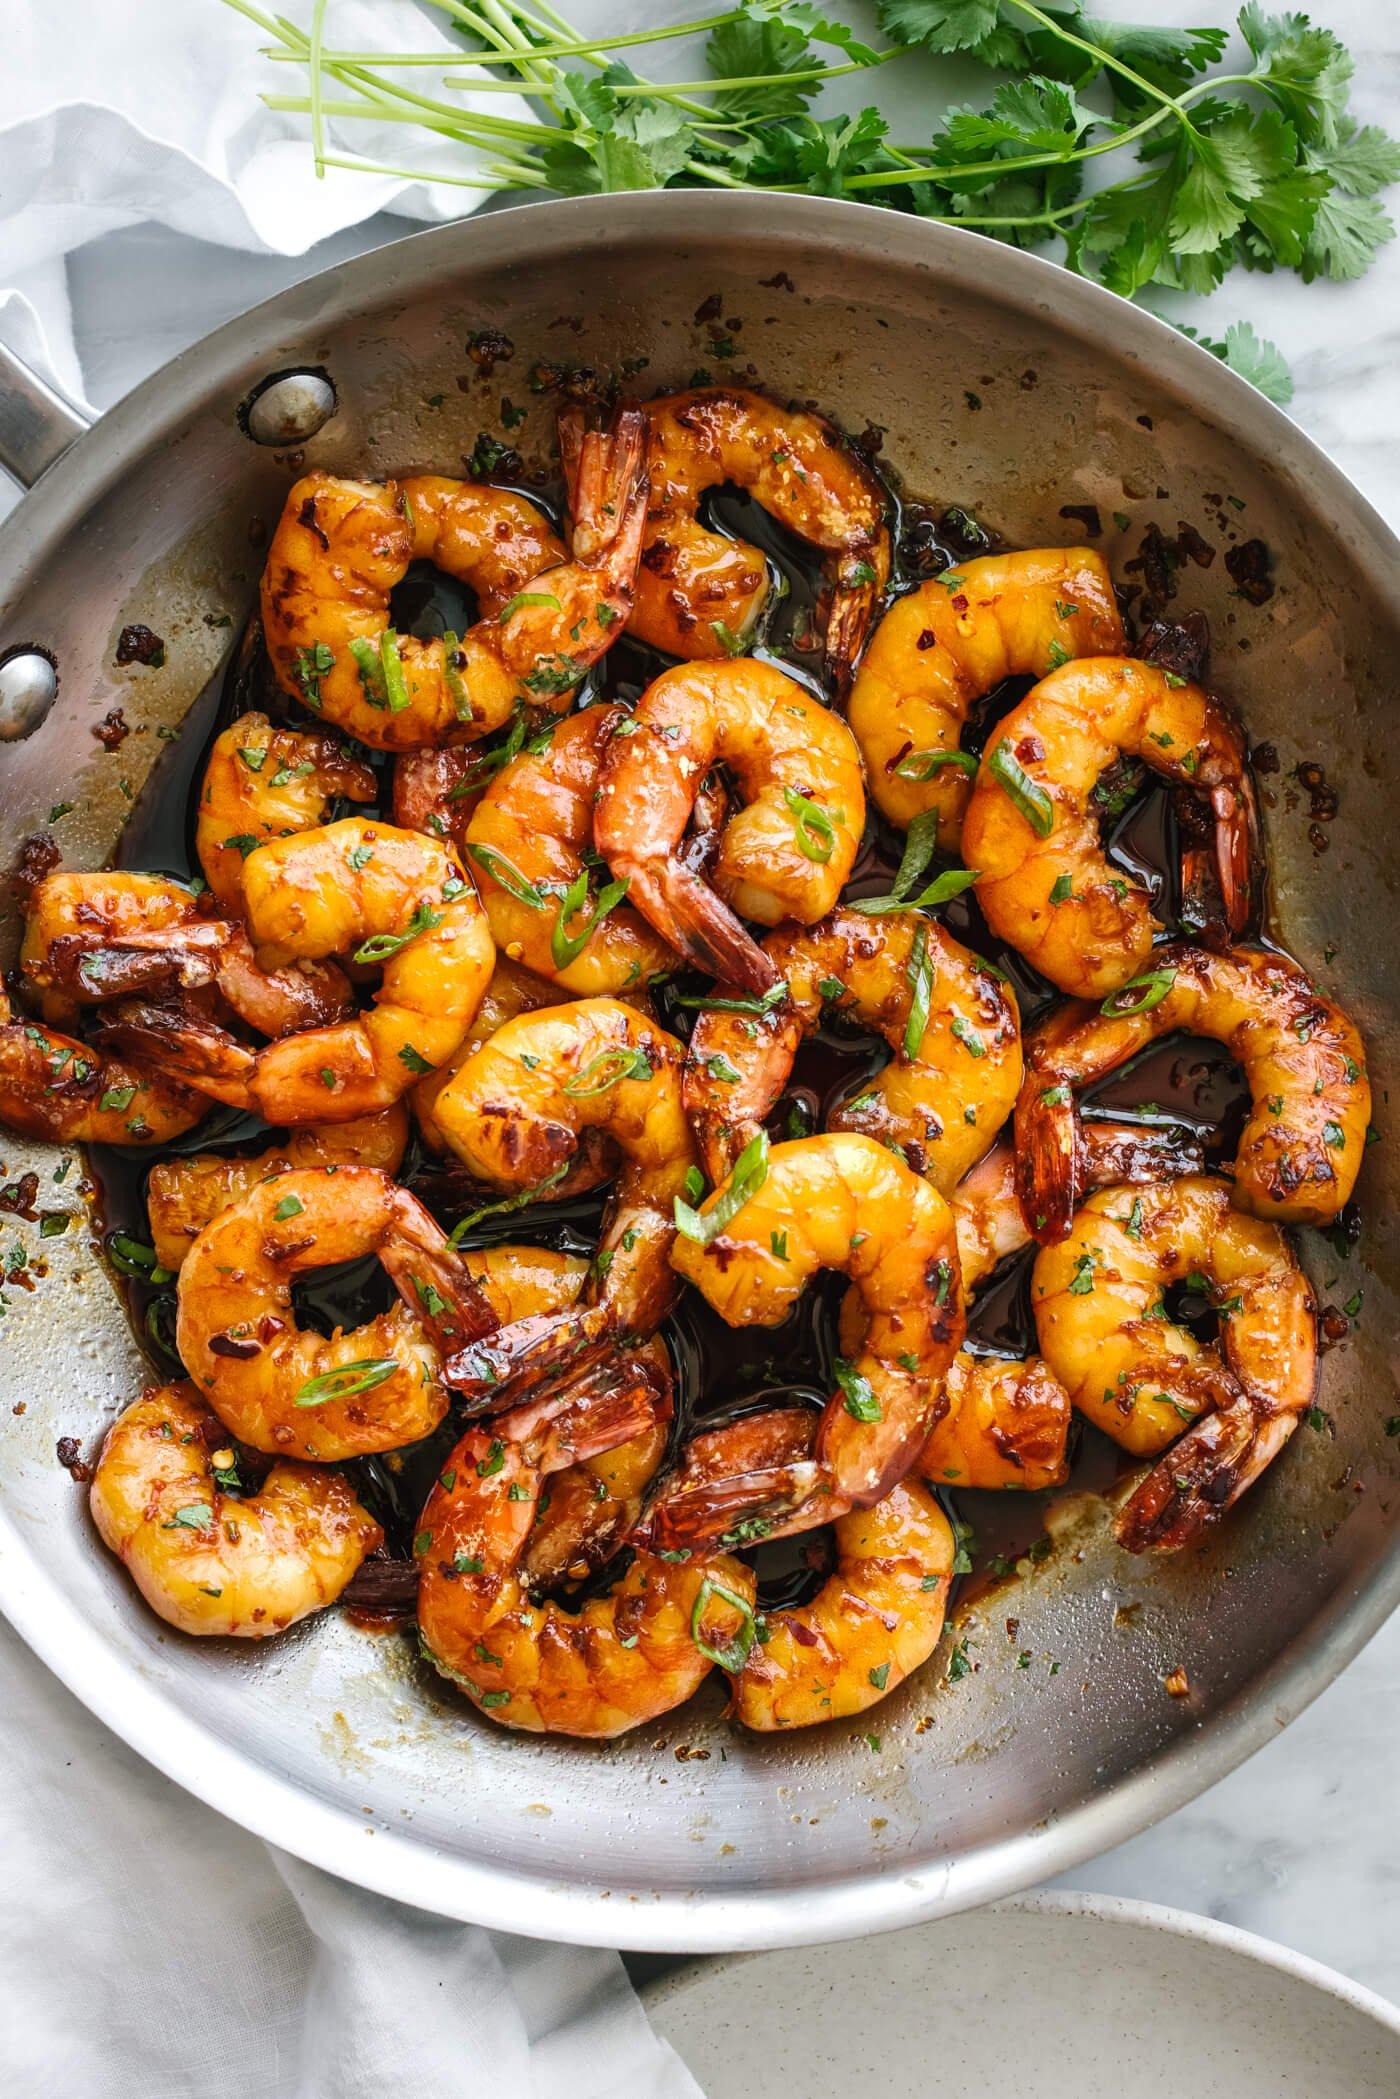 Honey garlic shrimp in a metal pan next to cilantro